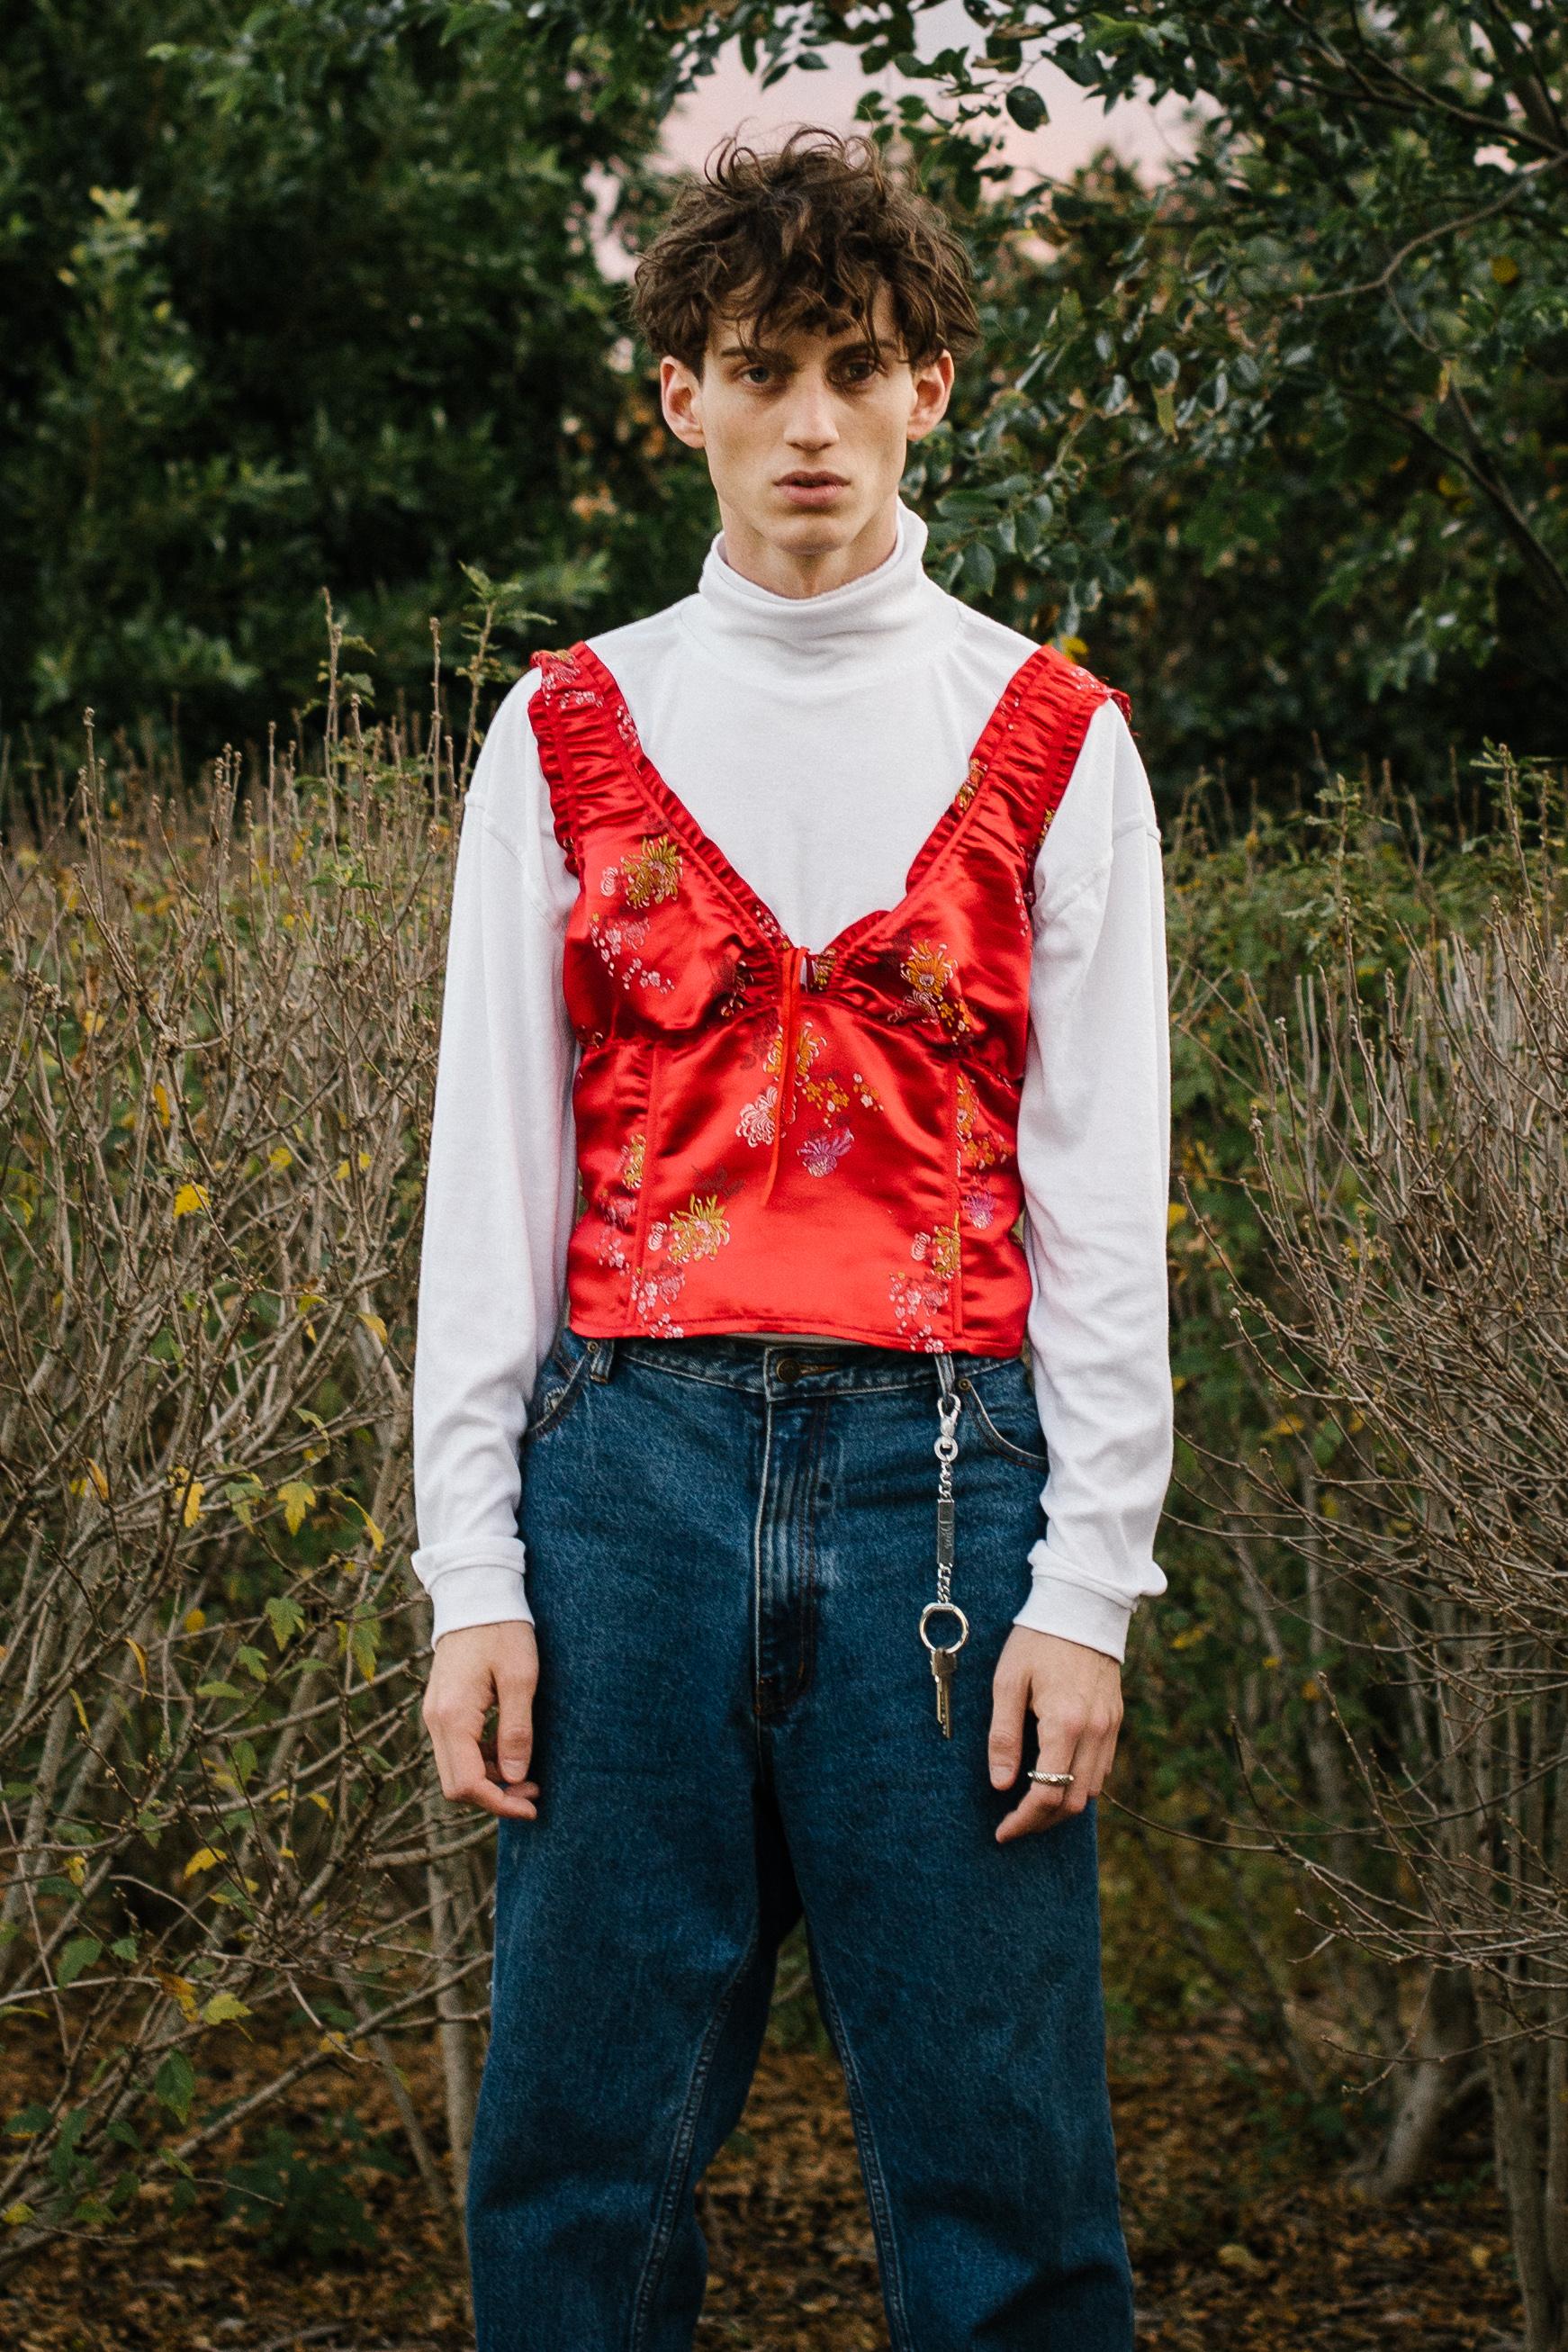 turtle neck Lanvin, top Stylists own, jeans Levis, key chain Dior, shoes Gucci